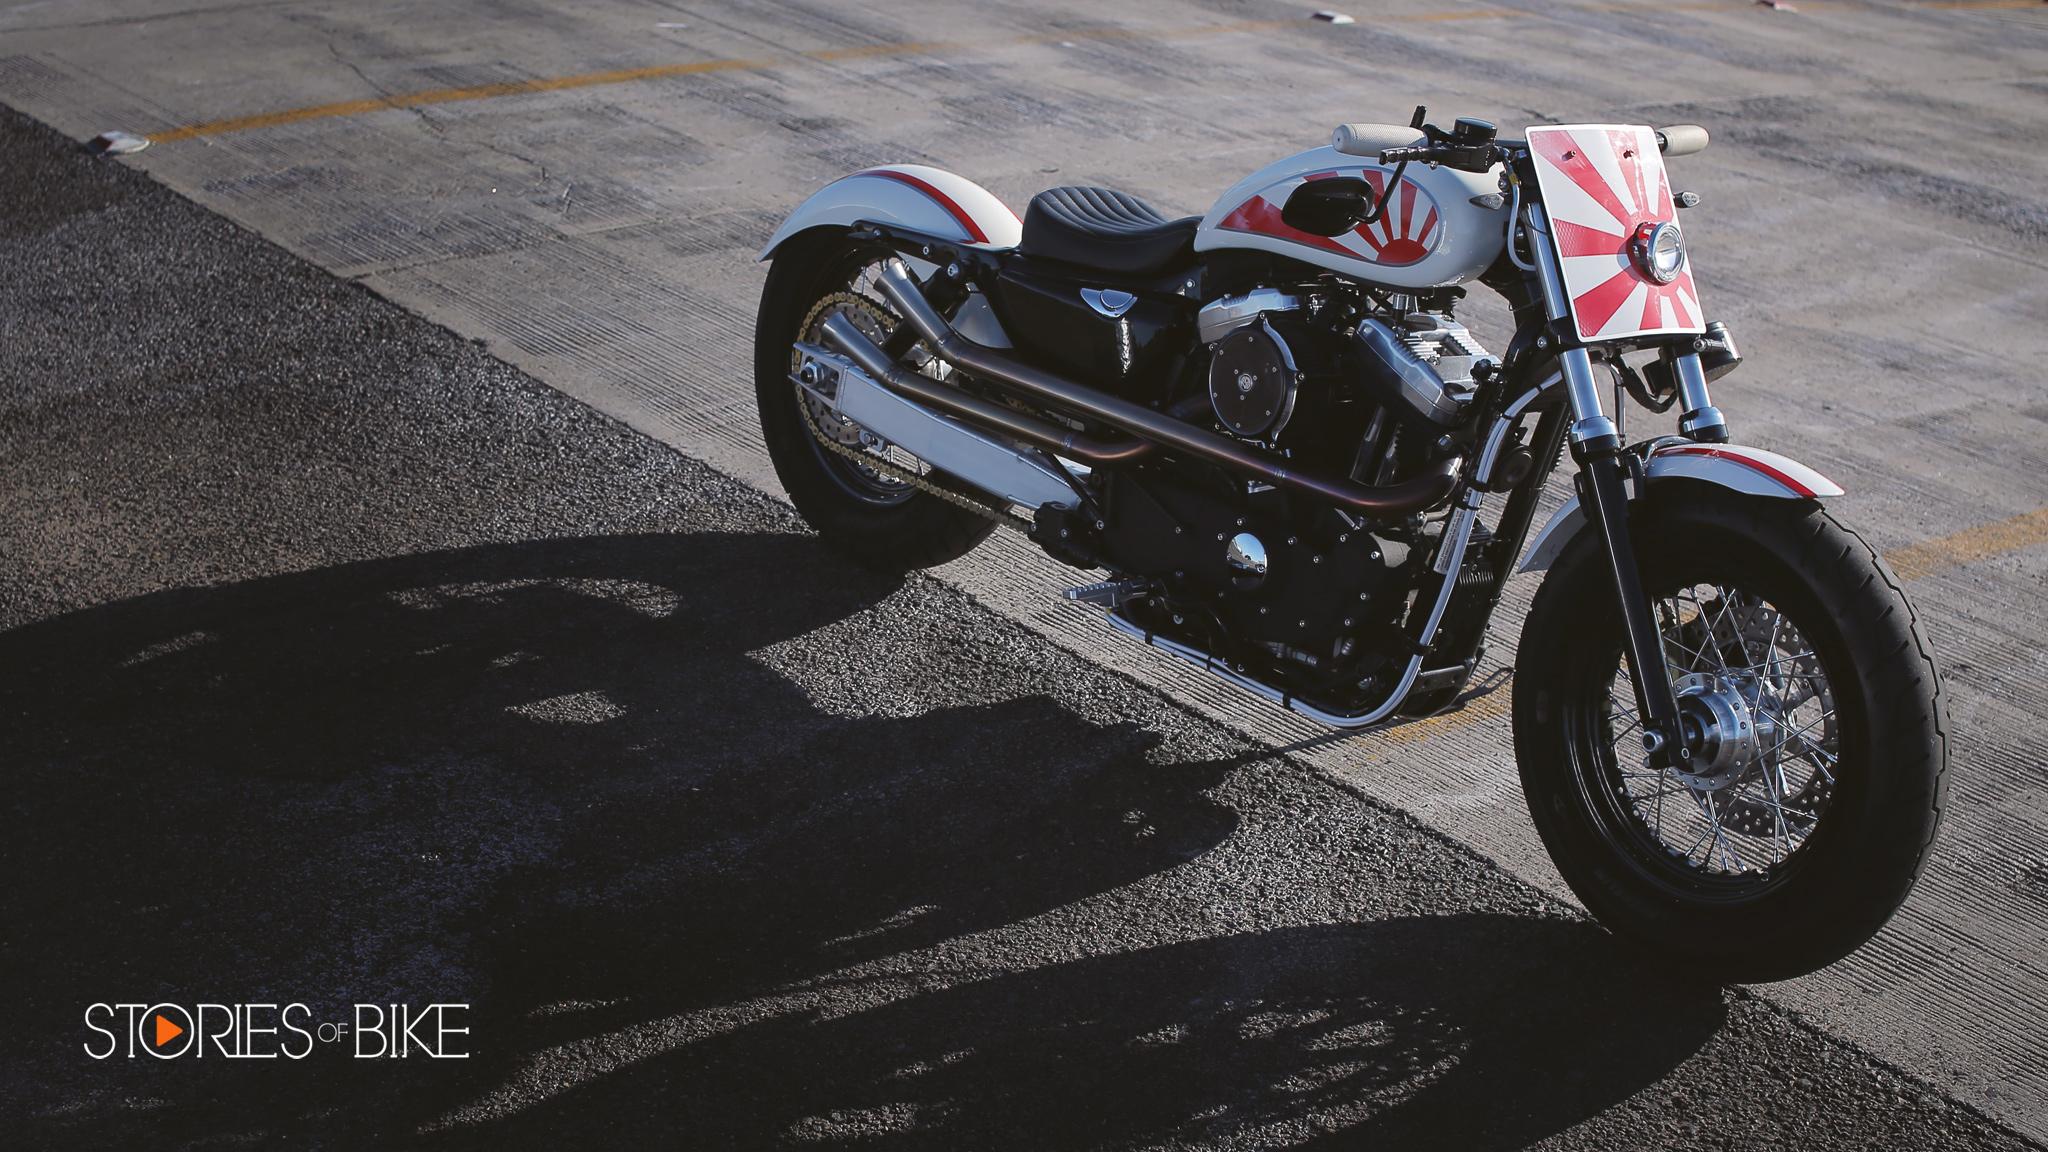 Stories_of_Bike_TwoCities_KK_Part3_5.jpg